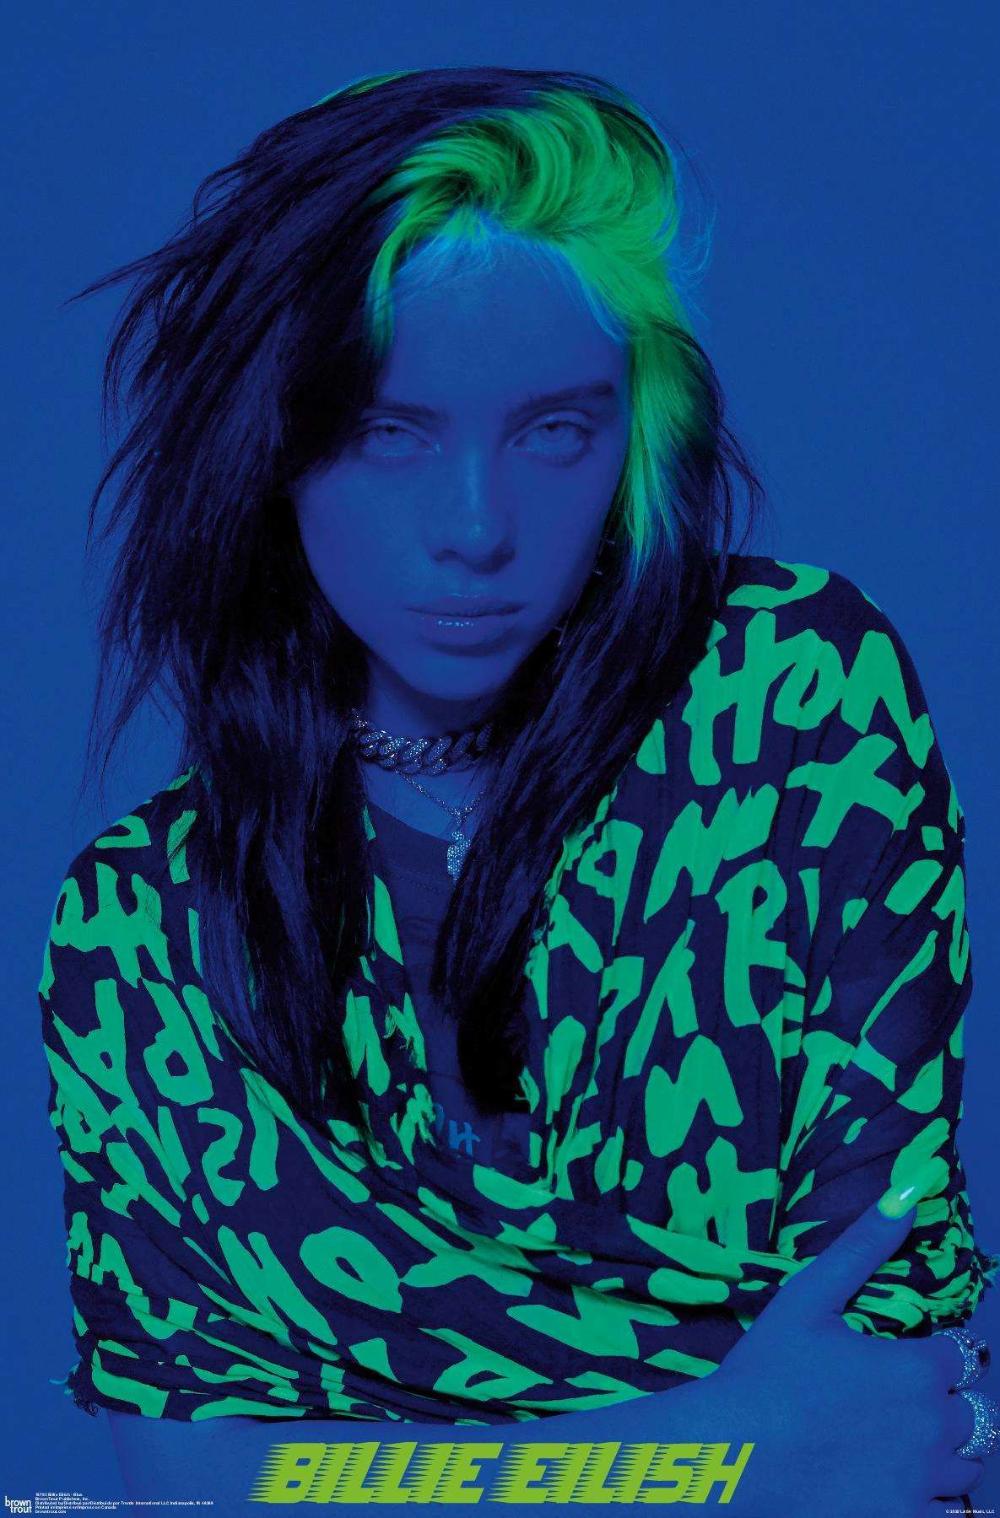 Billie Eilish - Blue